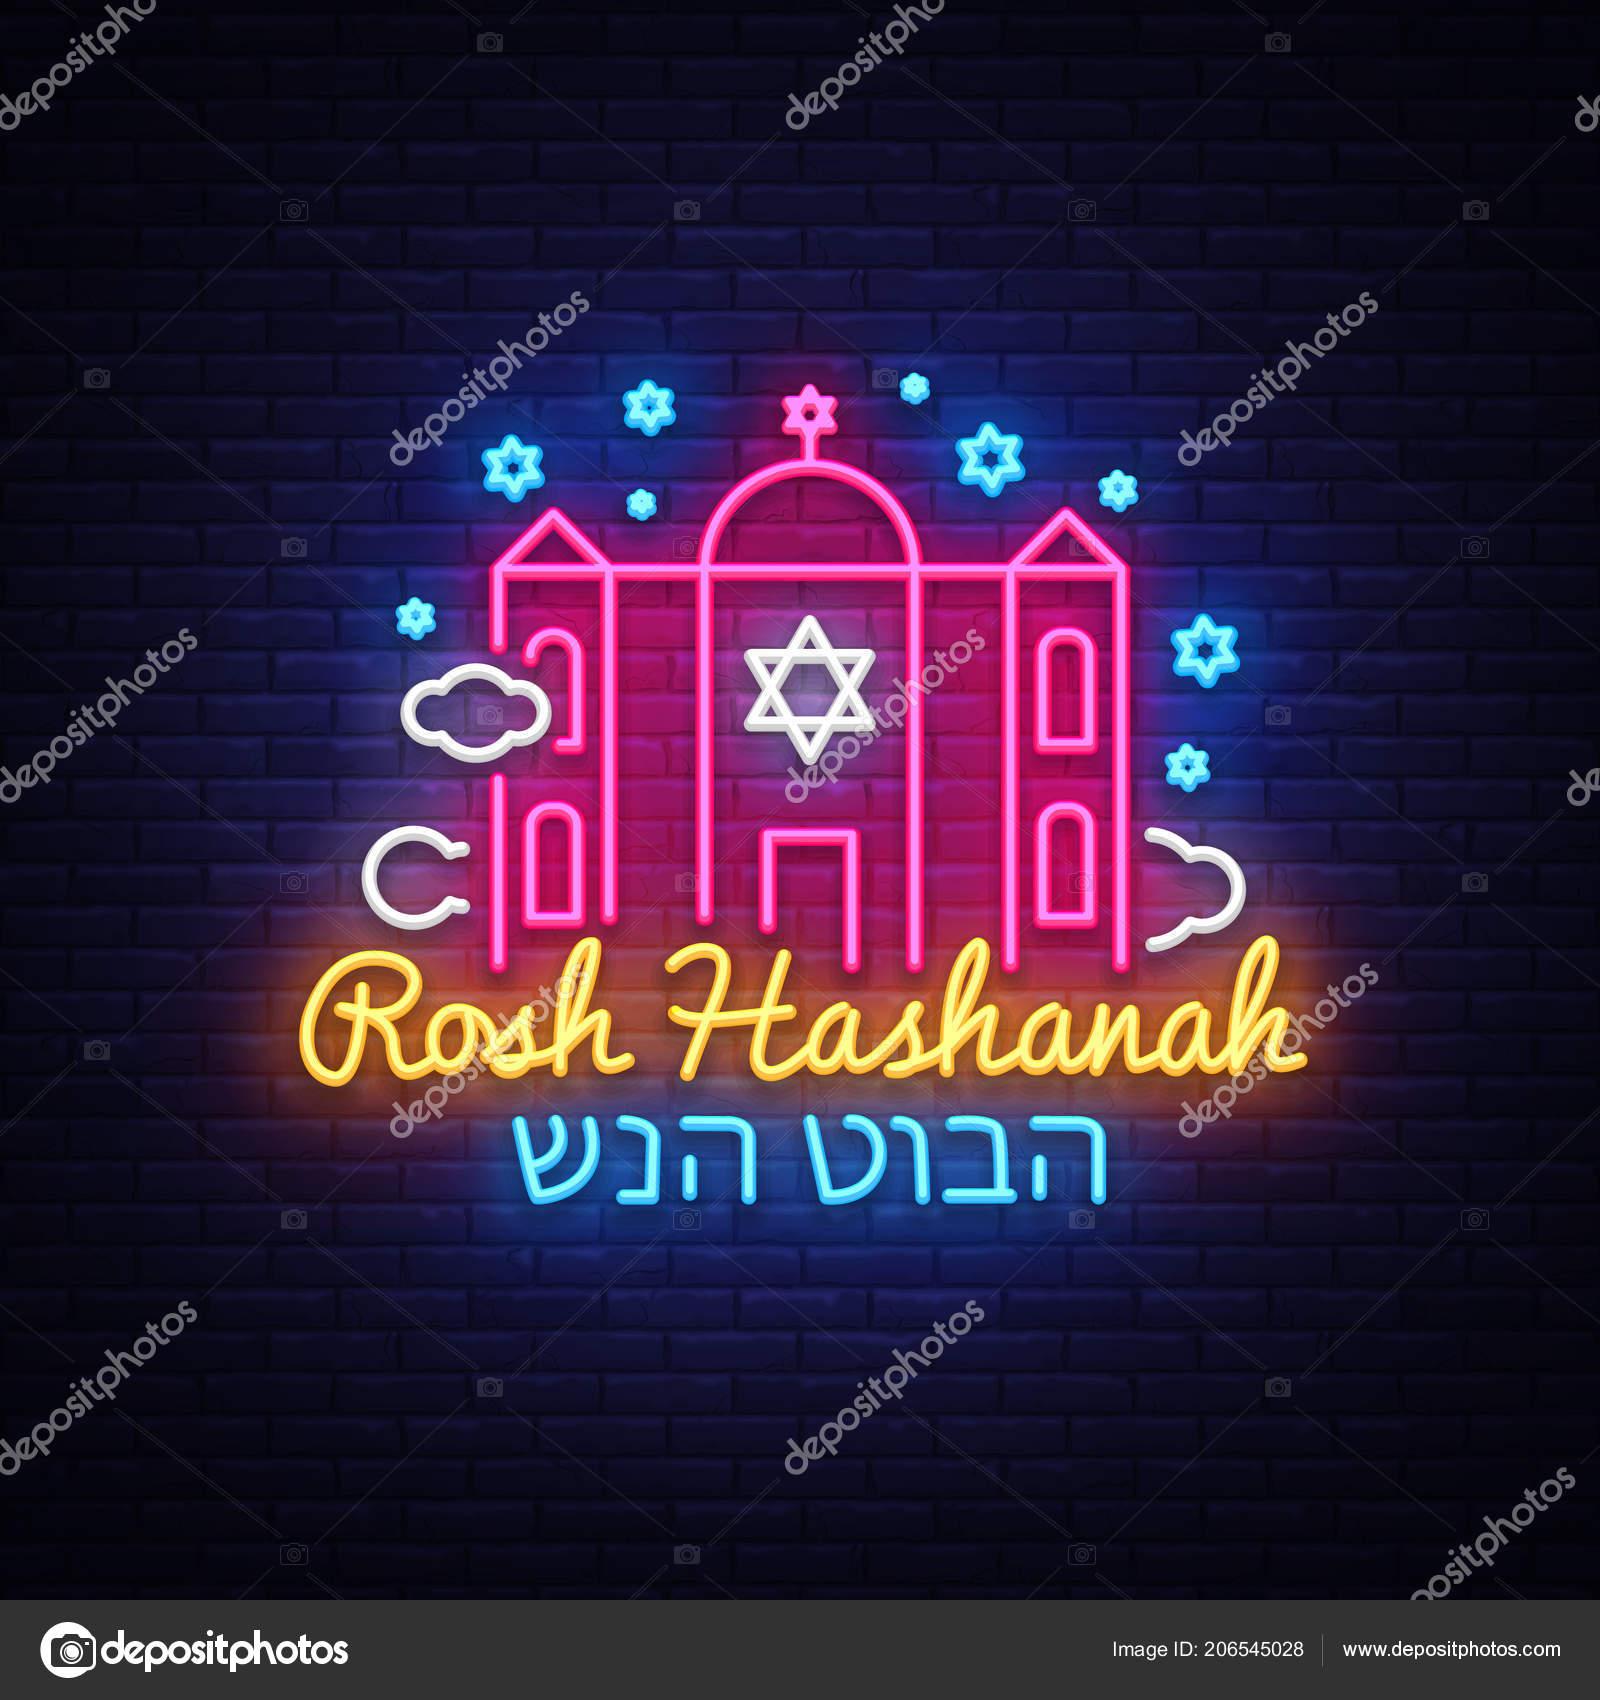 Rosh Hashanah Greeting Card Design Templet Vector Illustration